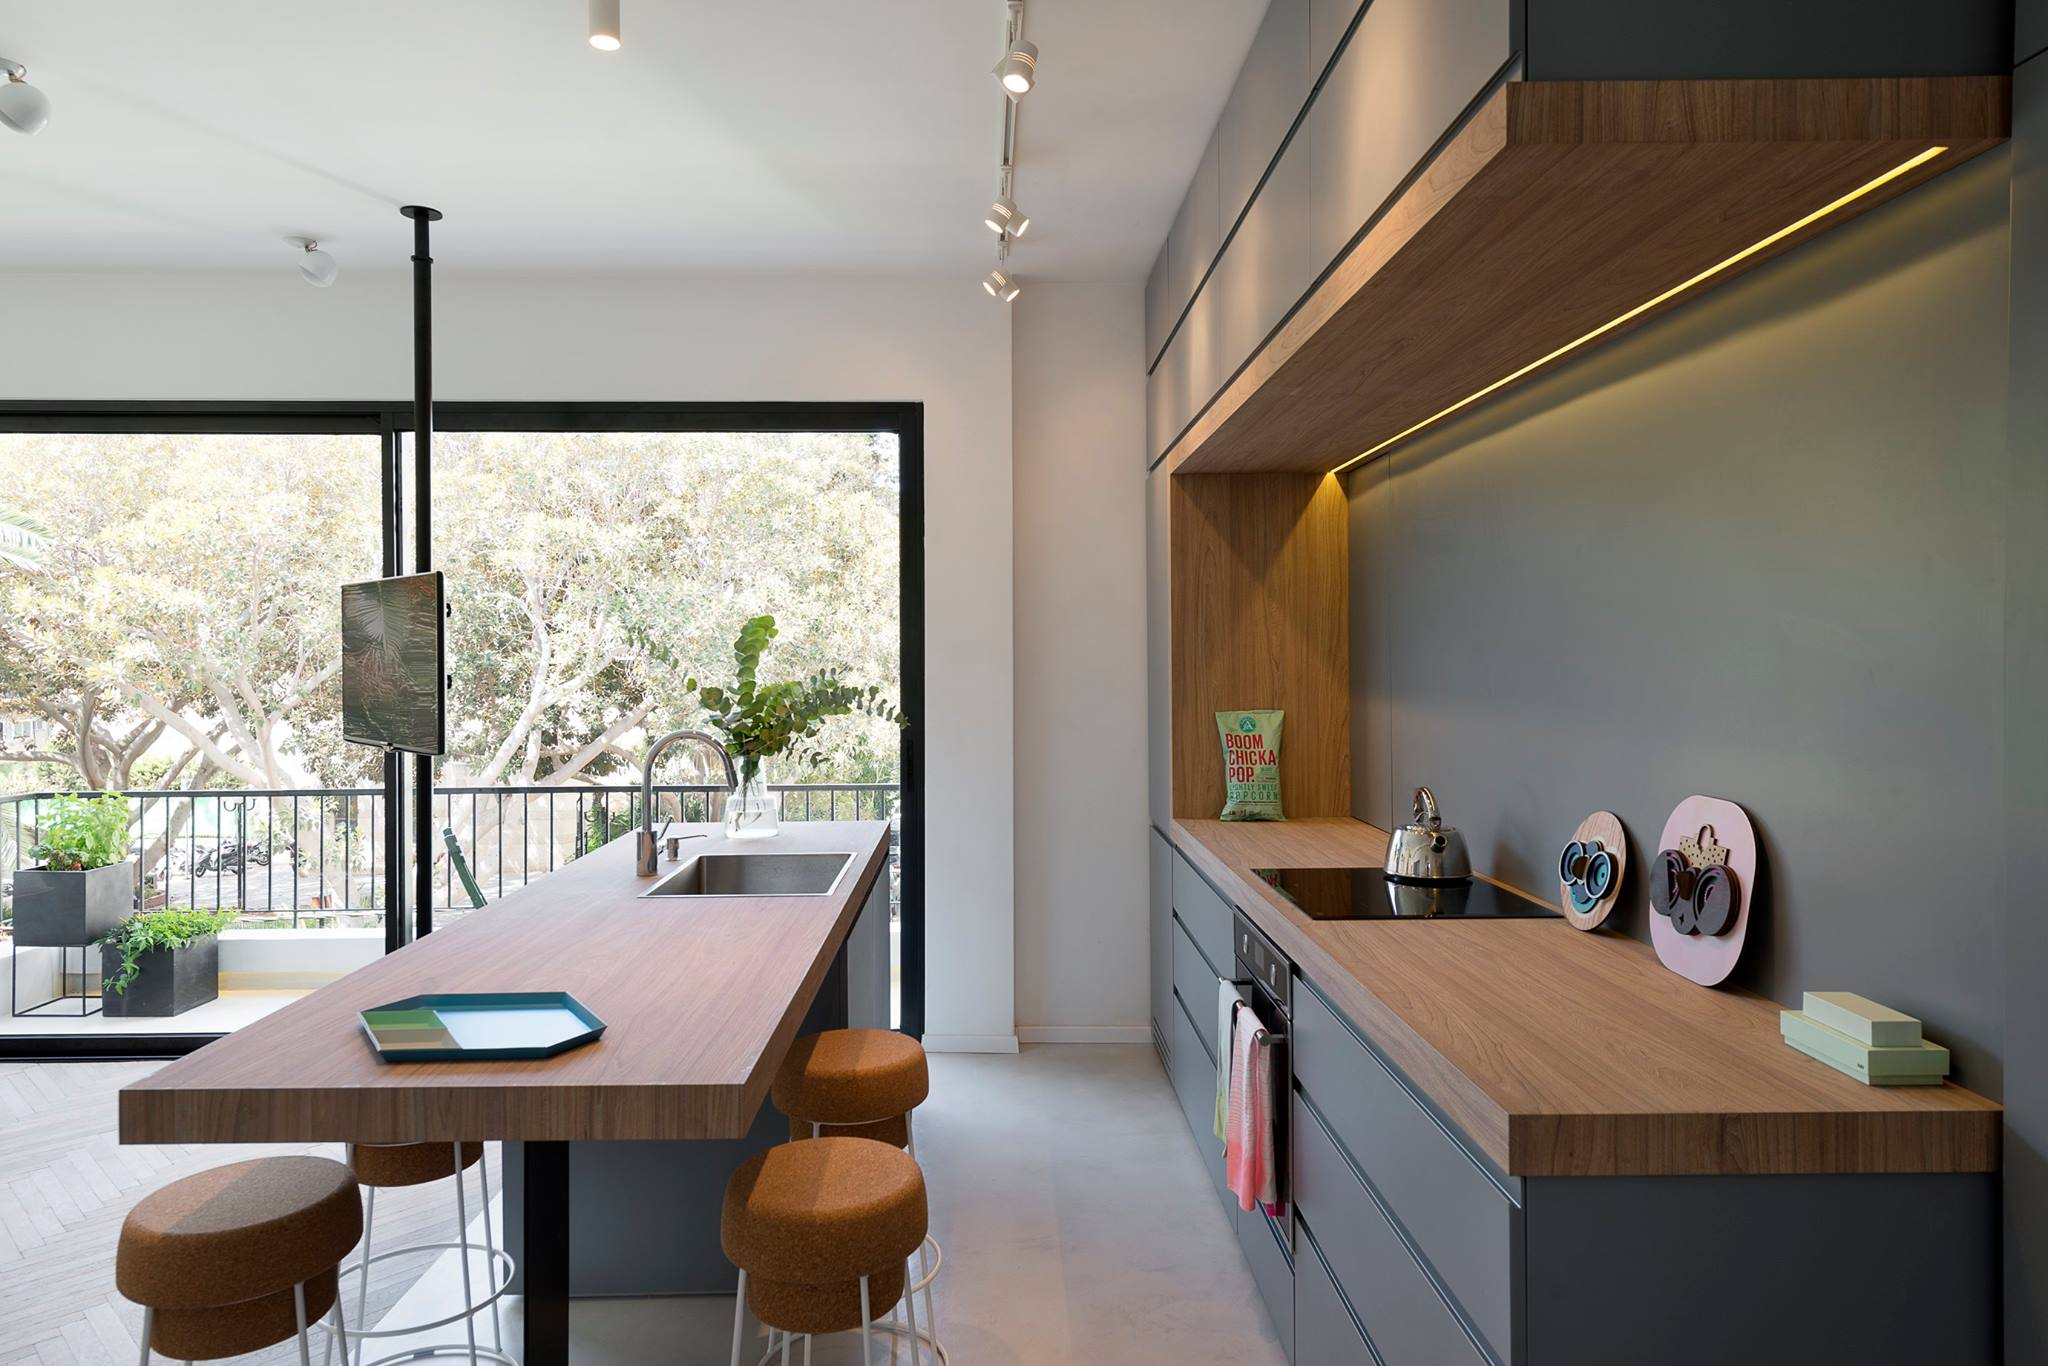 35 ispirazioni per una arredare la cucina a vista living for Arredamento living